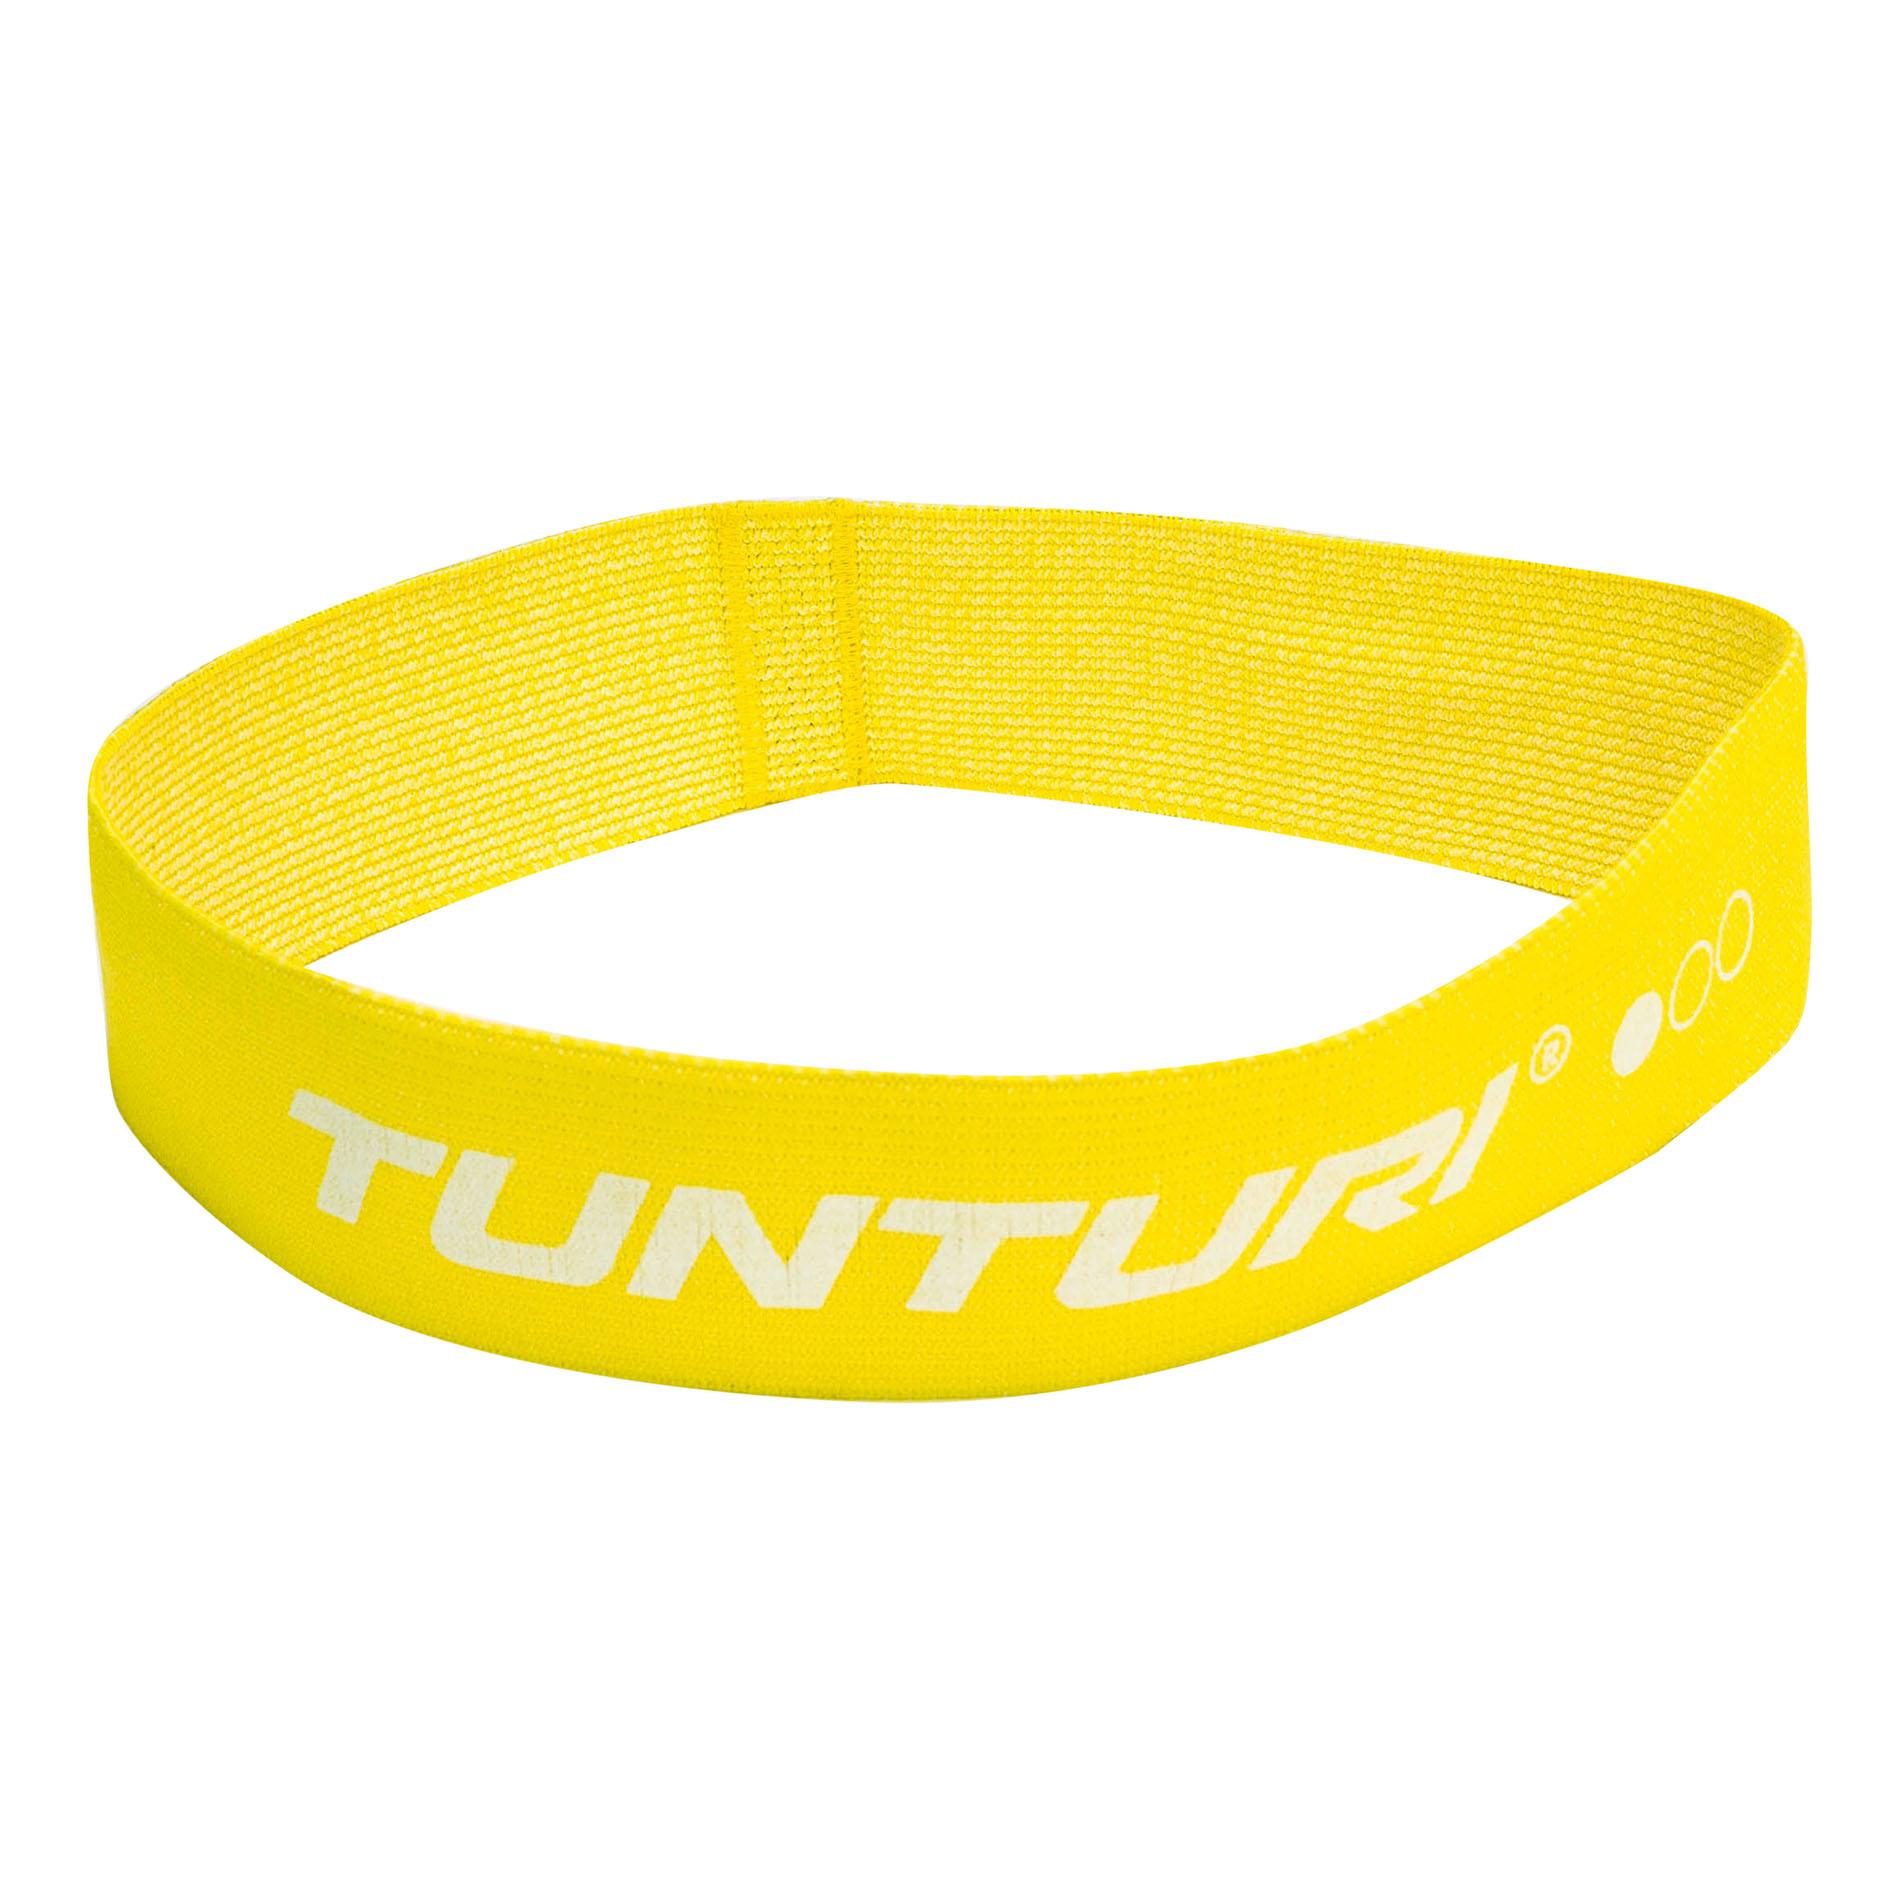 Weerstandsband textiel - resistance band